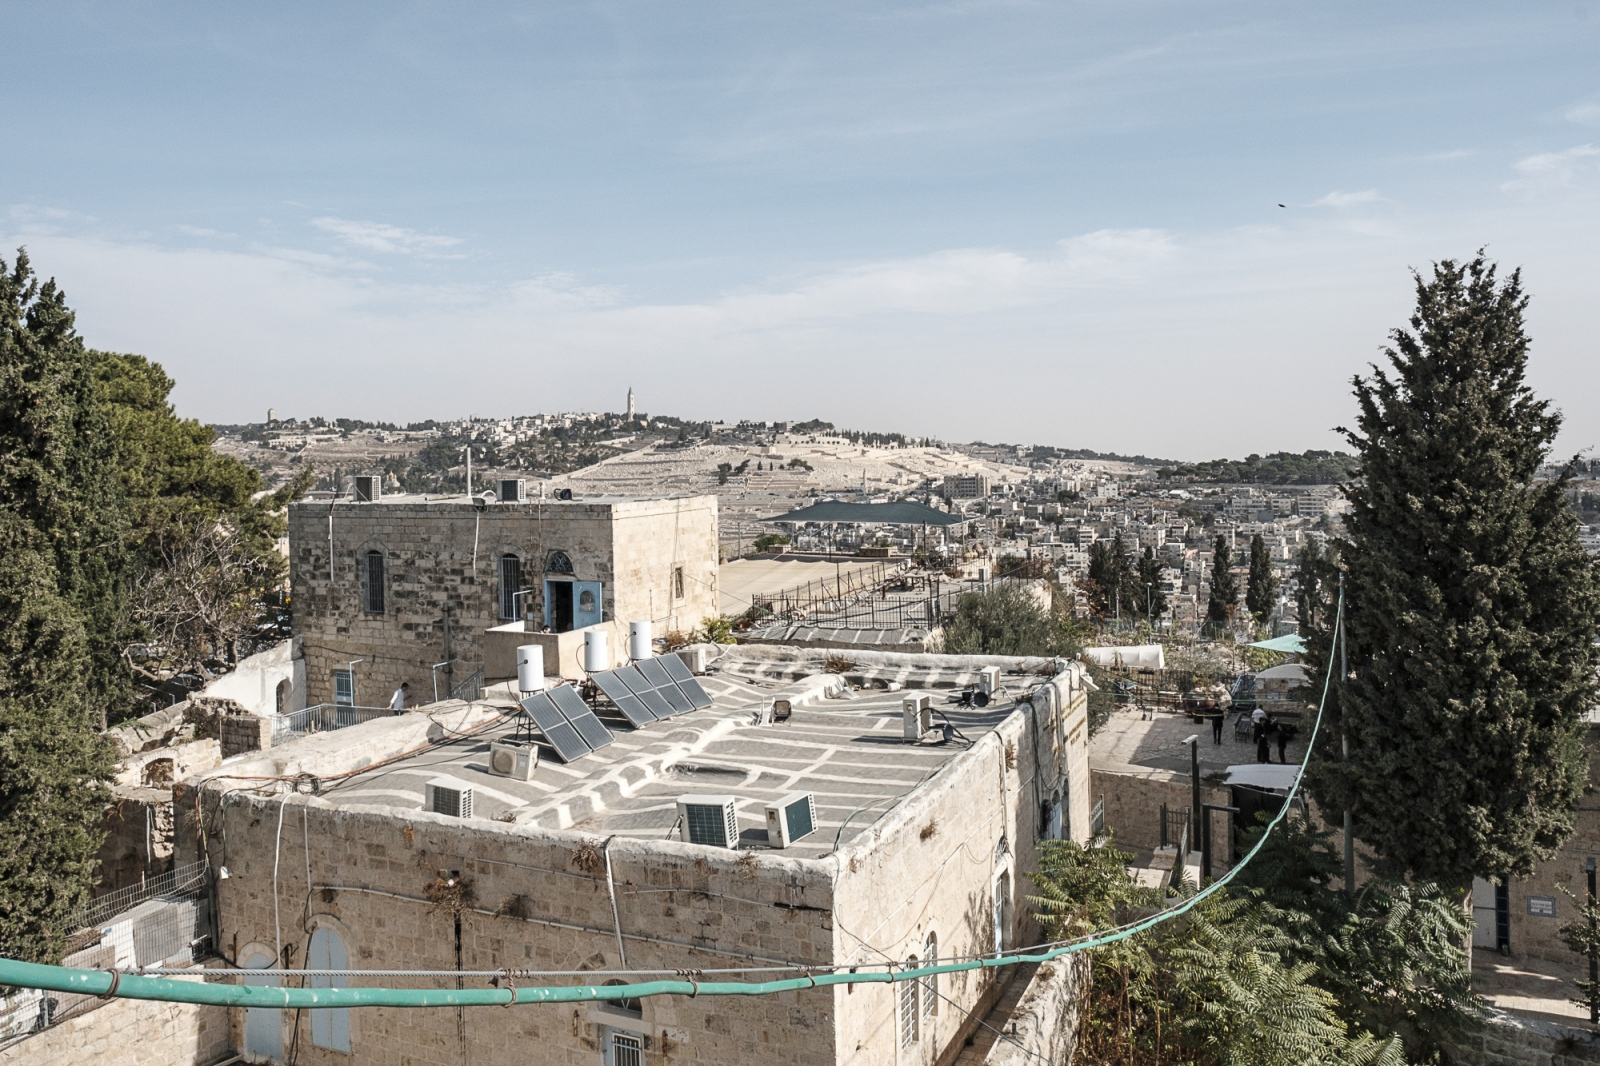 Looking at the Mount of Olives, Jerusalem